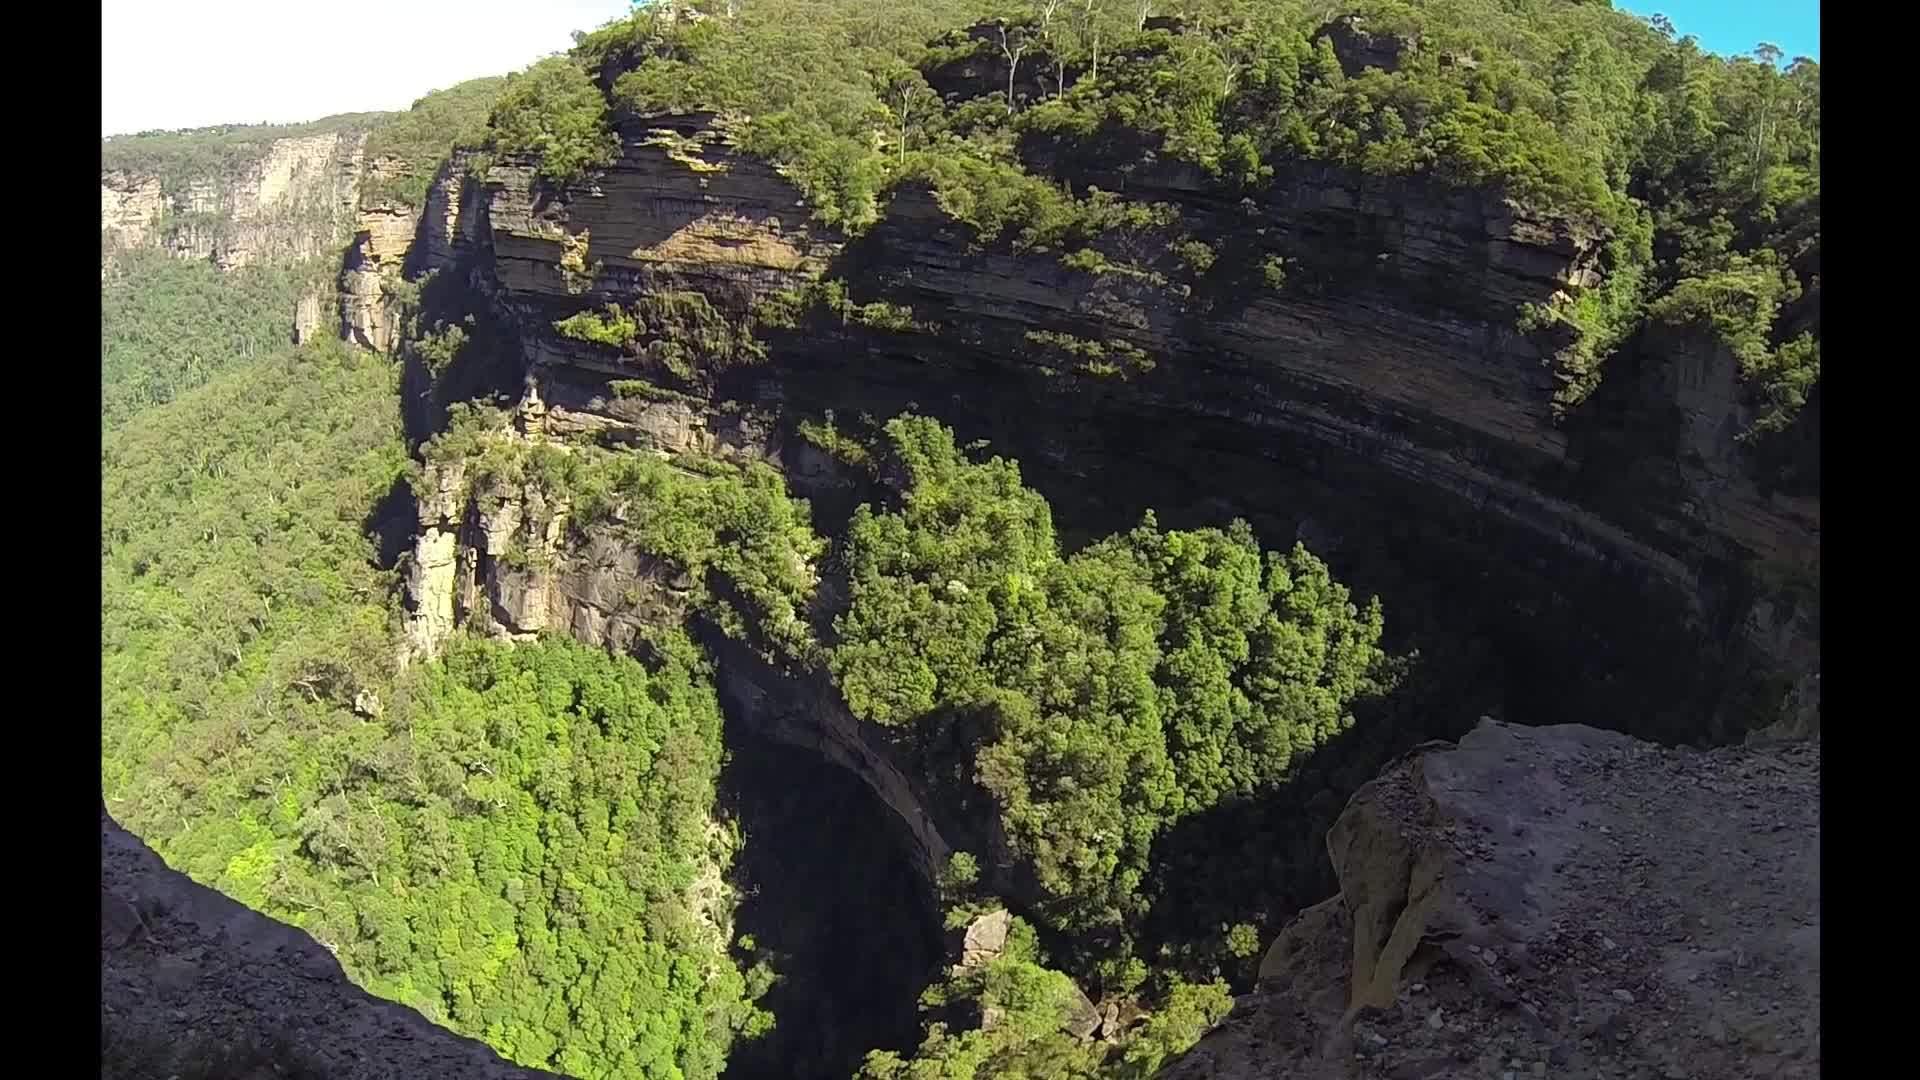 bluemountains, earthgifs, earthporngifs, Wentworth Falls Cliffs - Blue Mountains GIFs